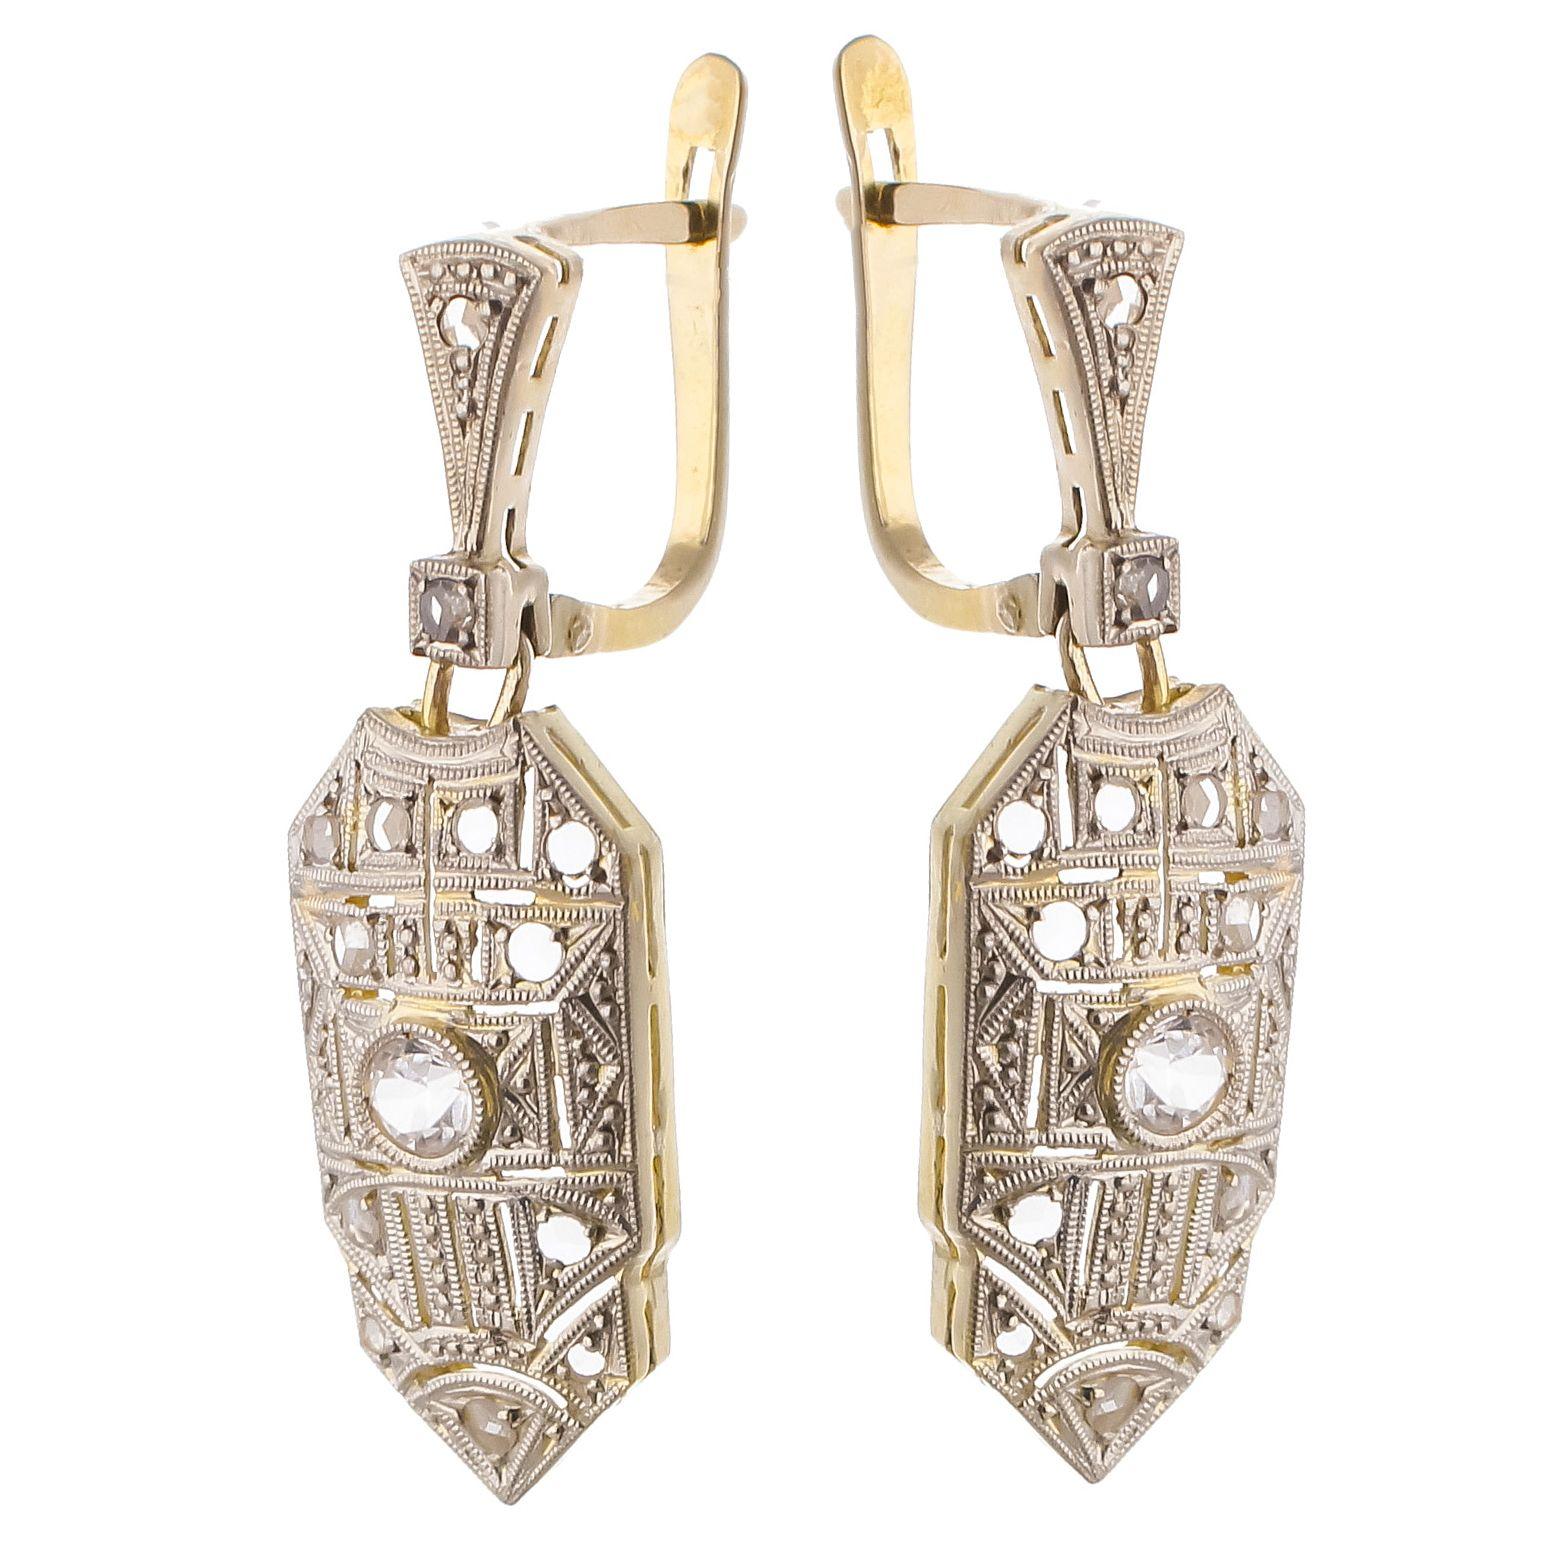 5a937ed34d9e Pendientes Art Deco de oro y platino con zafiros blancos   Joyas Art ...